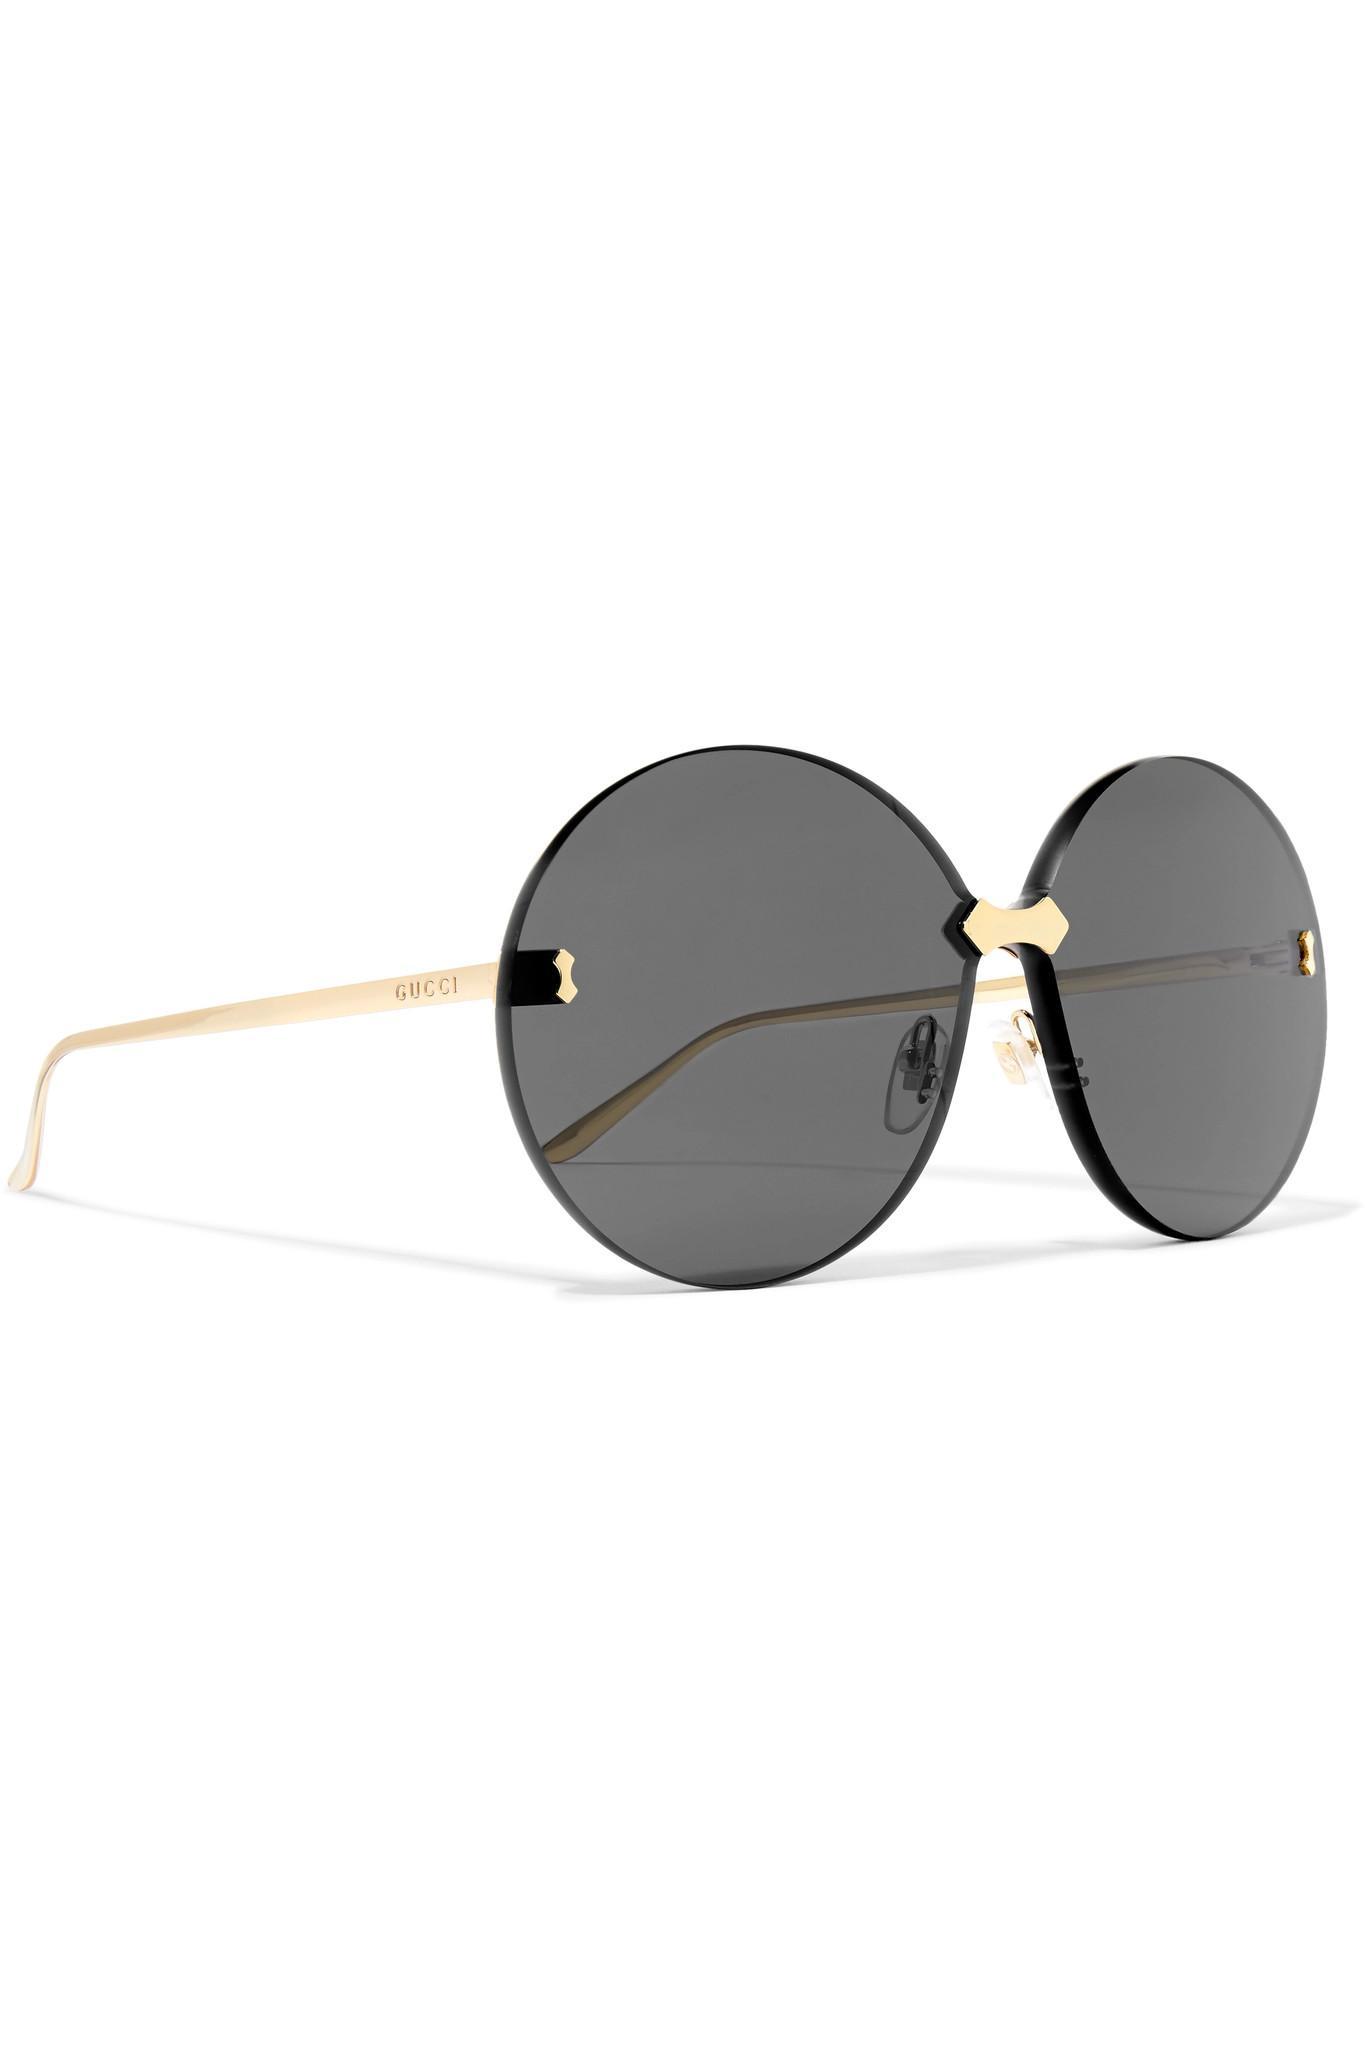 9b8d52ebabc Gucci - Gray Round-frame Gold-tone Sunglasses - Lyst. View fullscreen